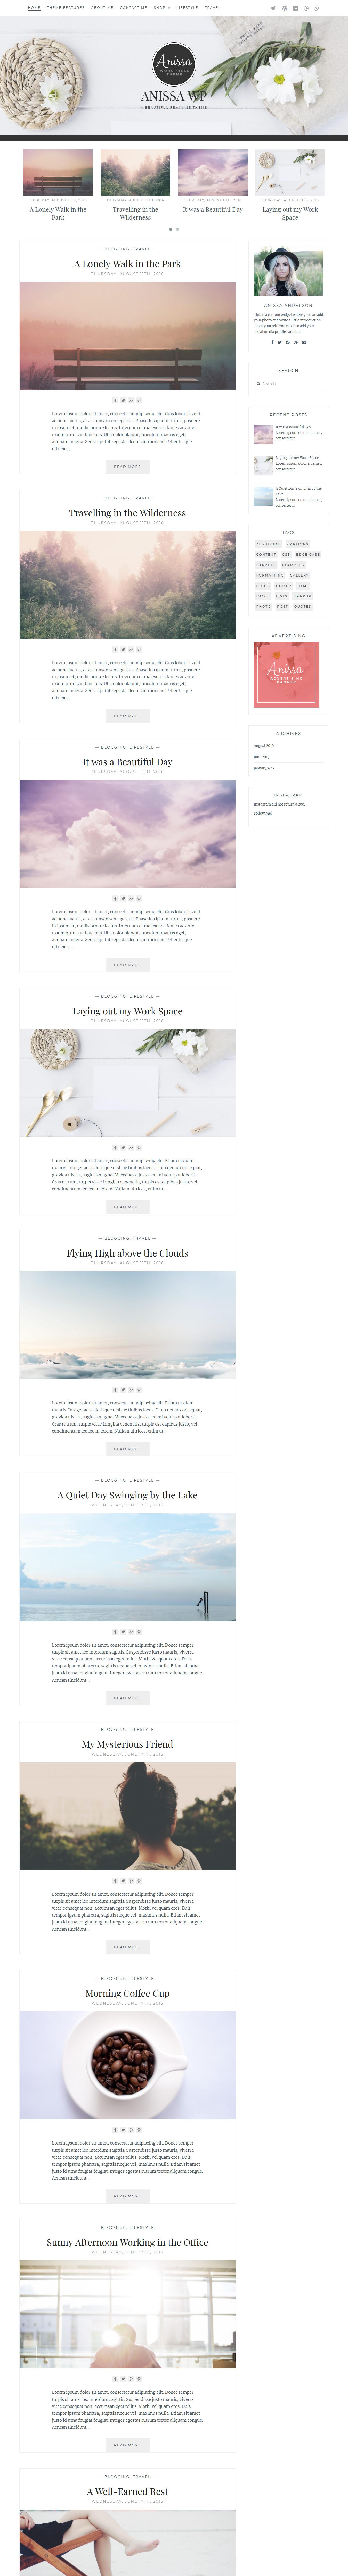 anissa best free feminine wordpress theme - 10+ Best Free Feminine WordPress Themes